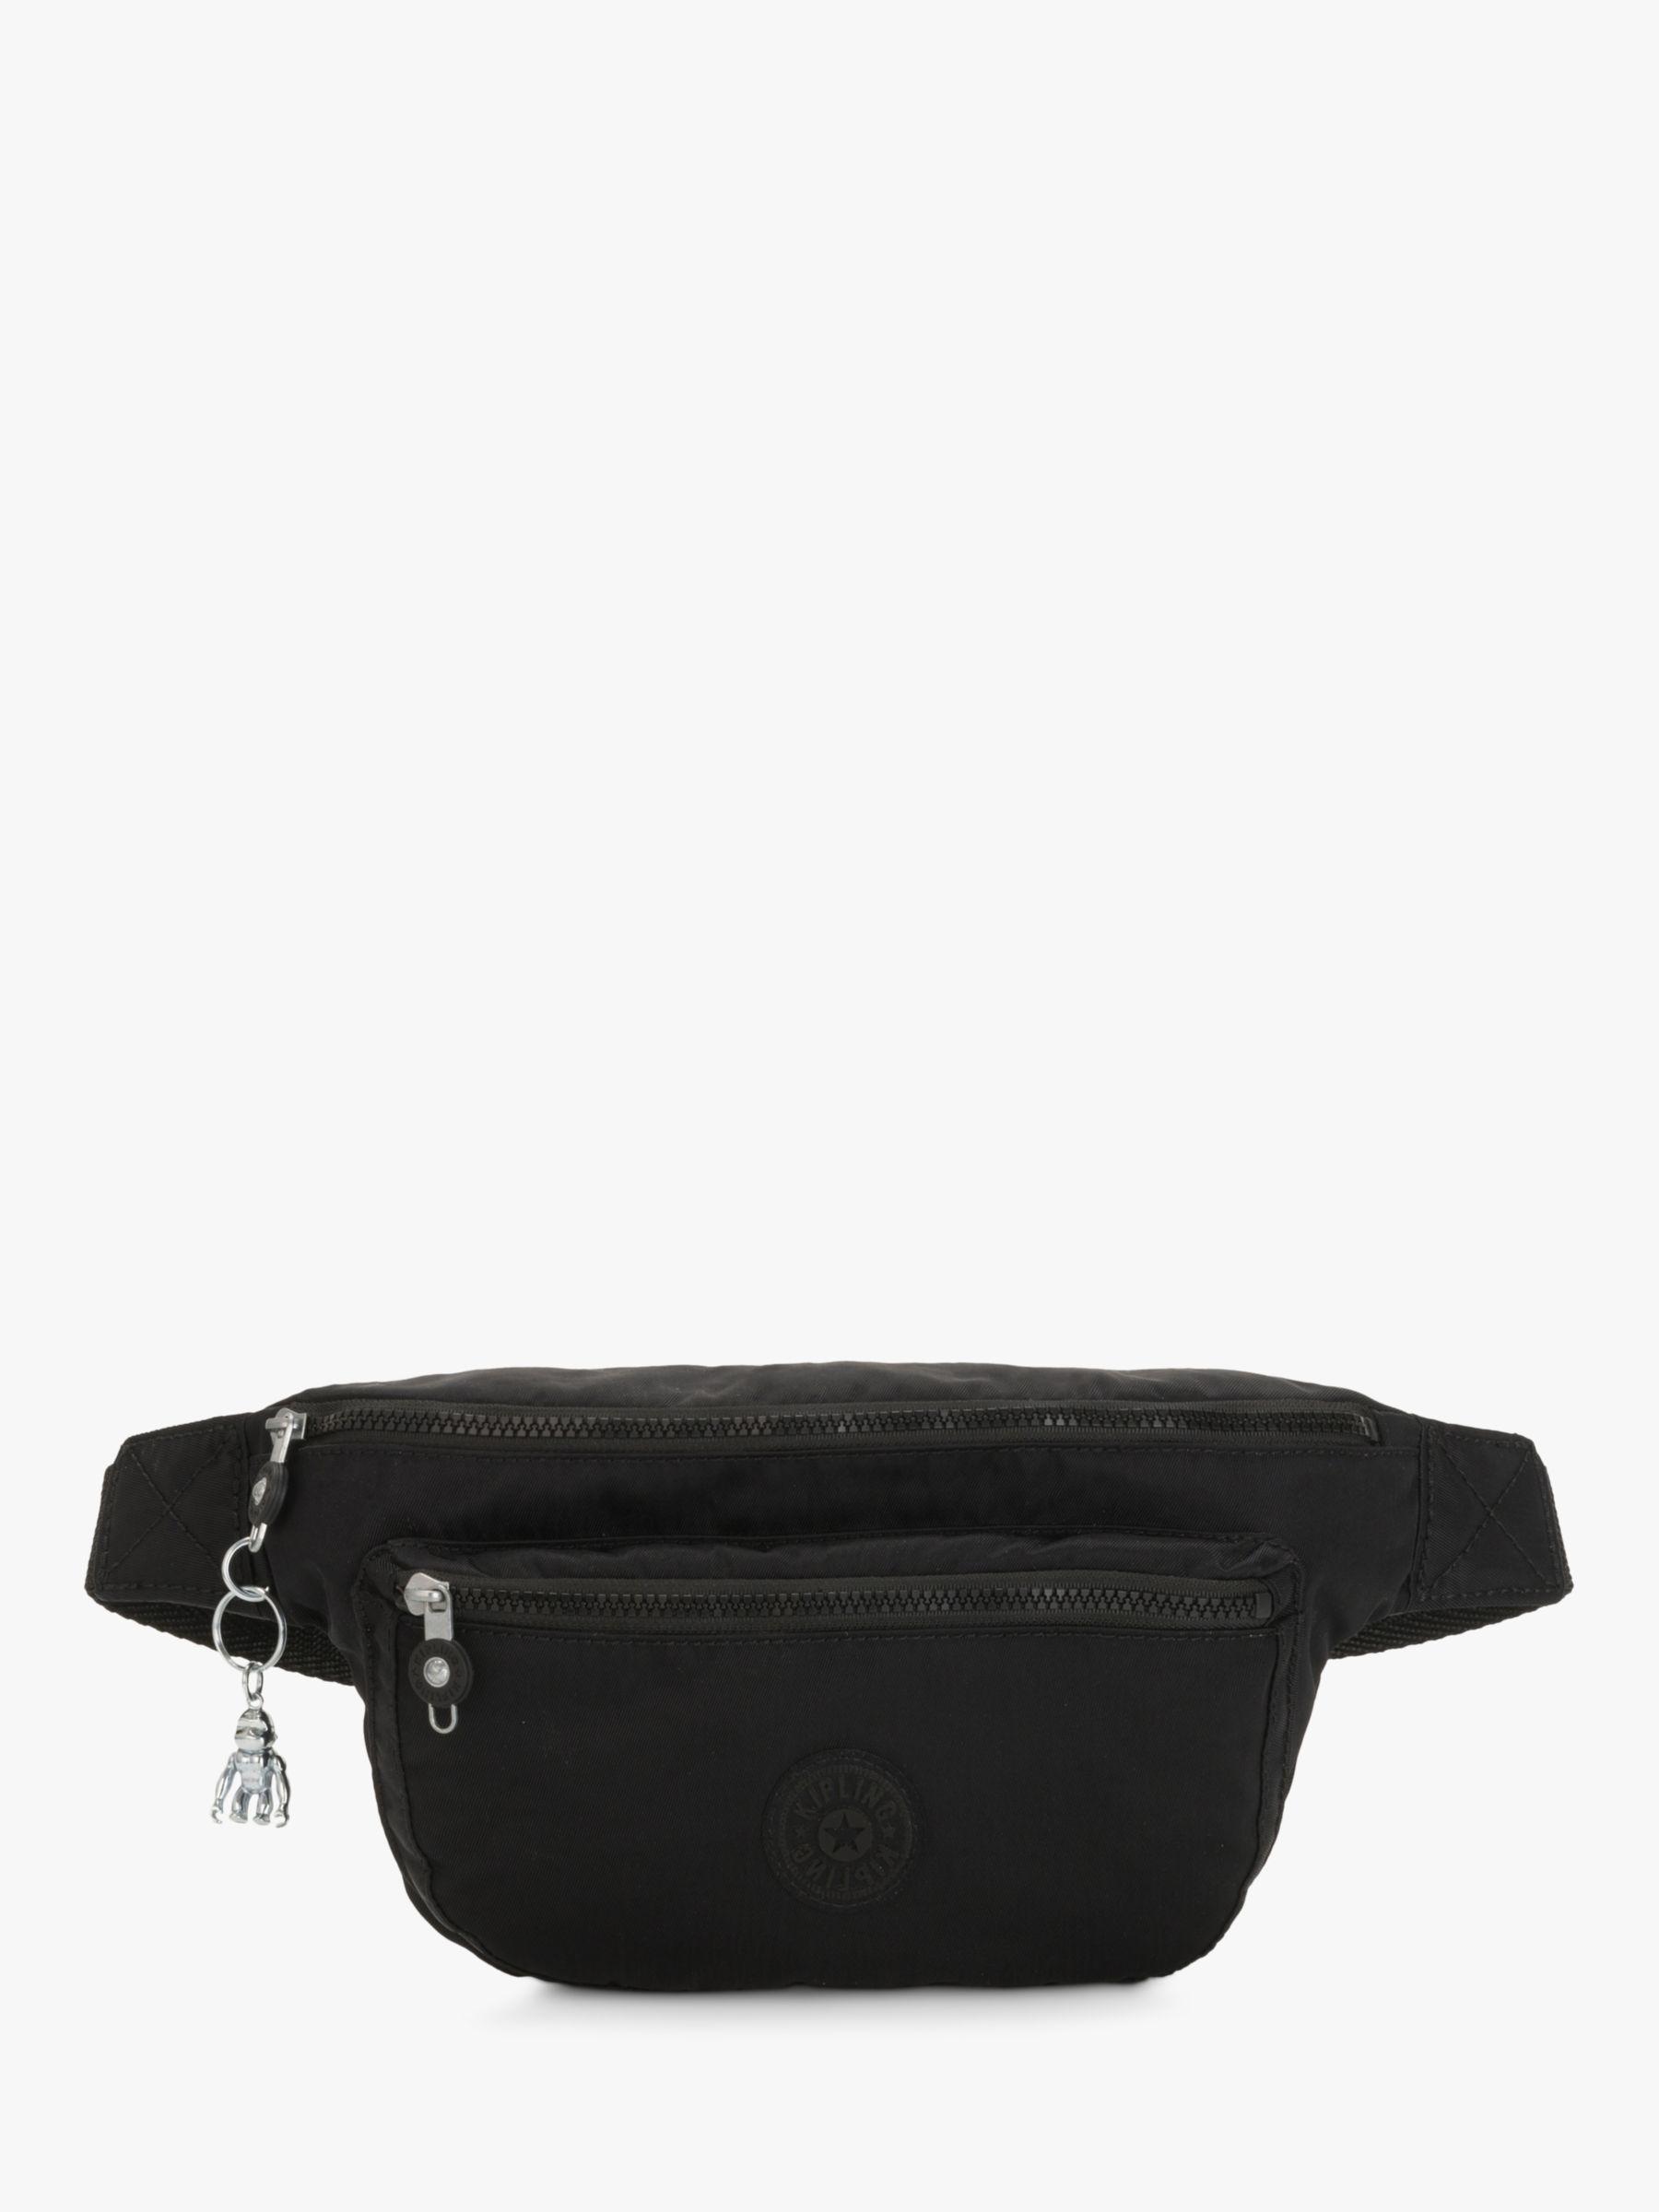 Kipling Kipling Yasemina XL Convertible Cross Body Bag, Rich Black